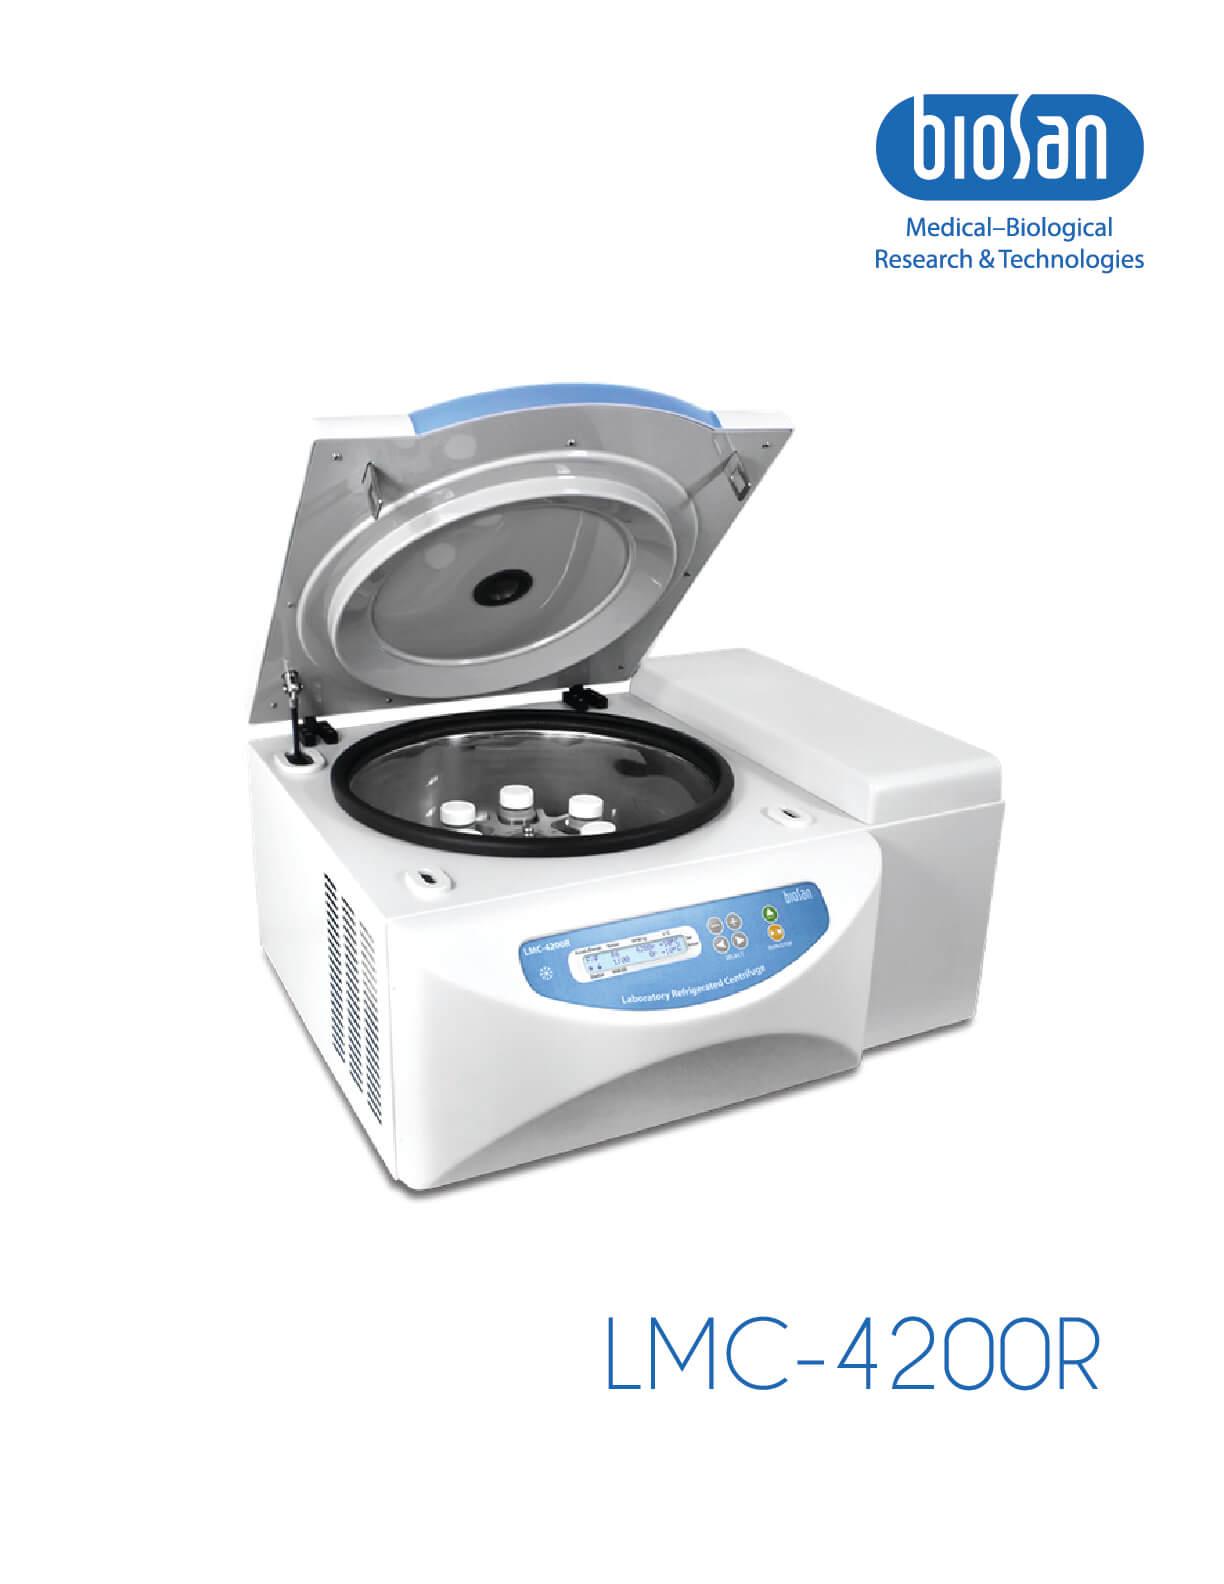 LMC-4200R, Laboratory Refrigerated Centrifuge